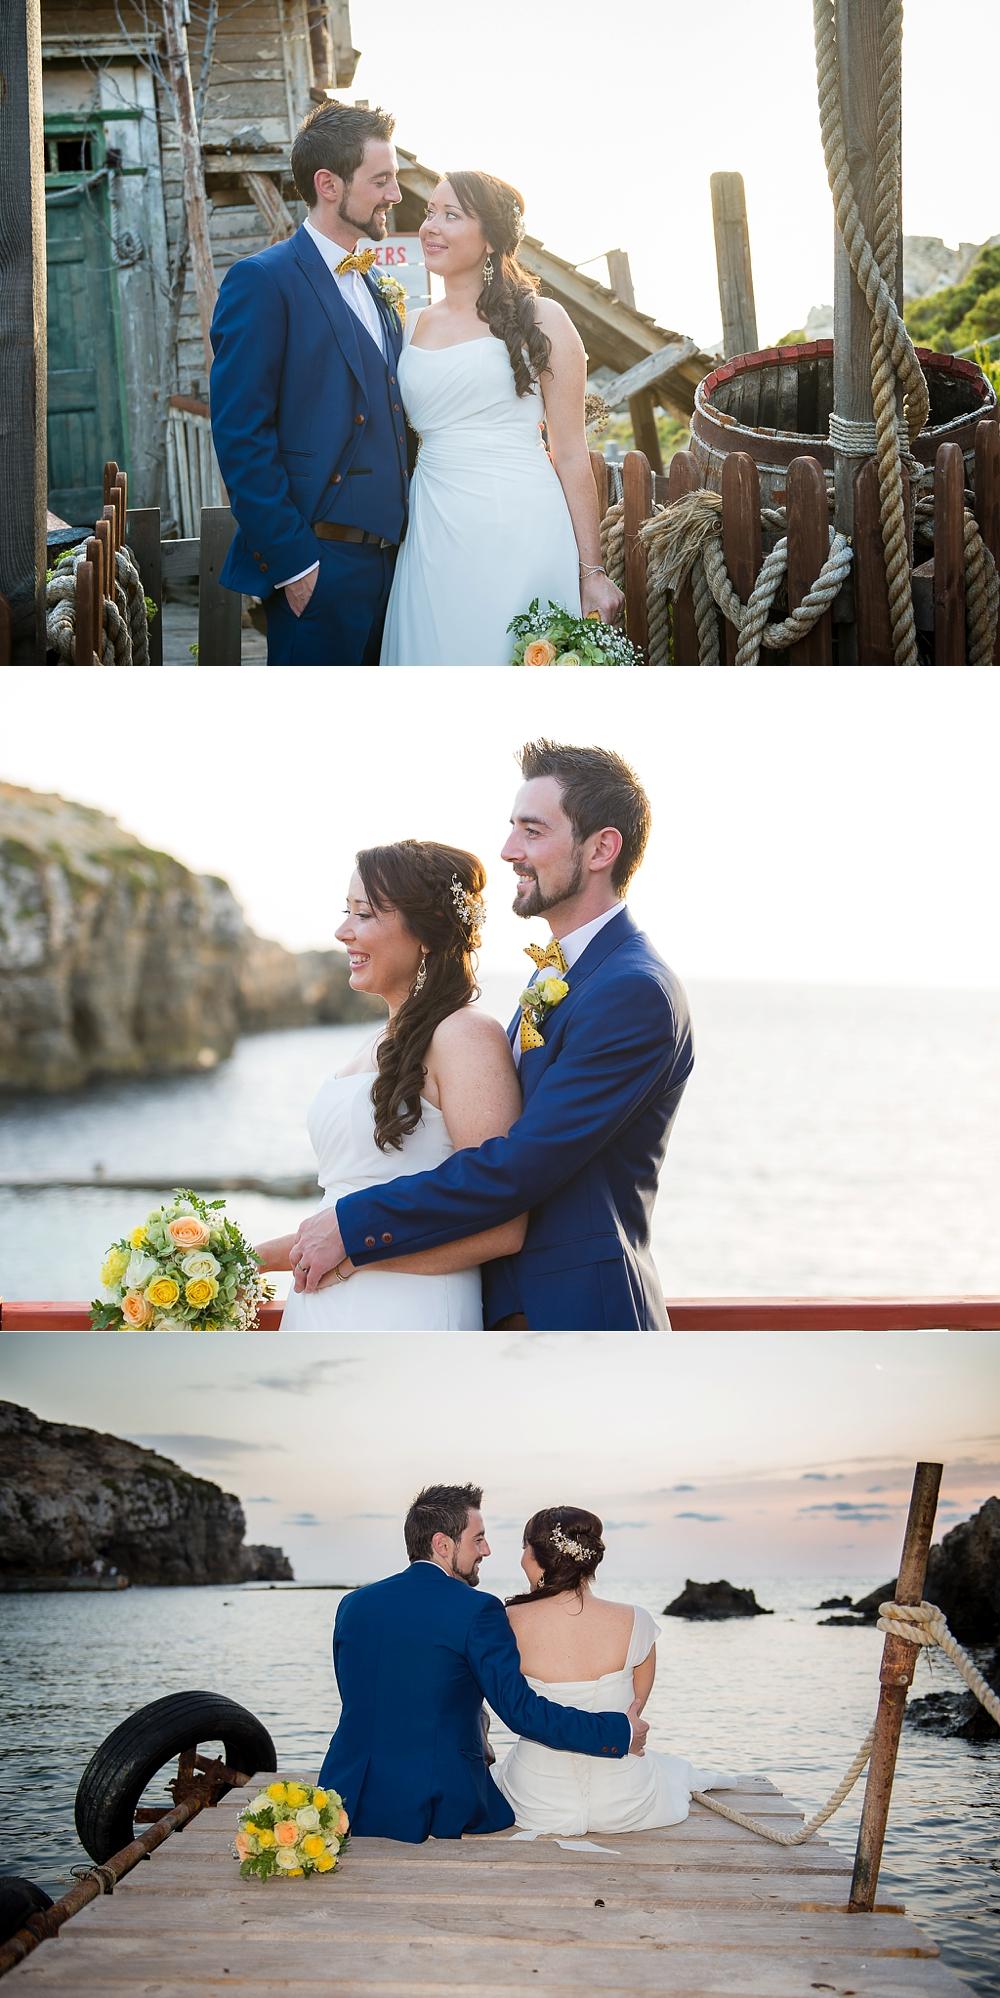 Wedding Photography - Shane P. Watts - Popeye Village Malta